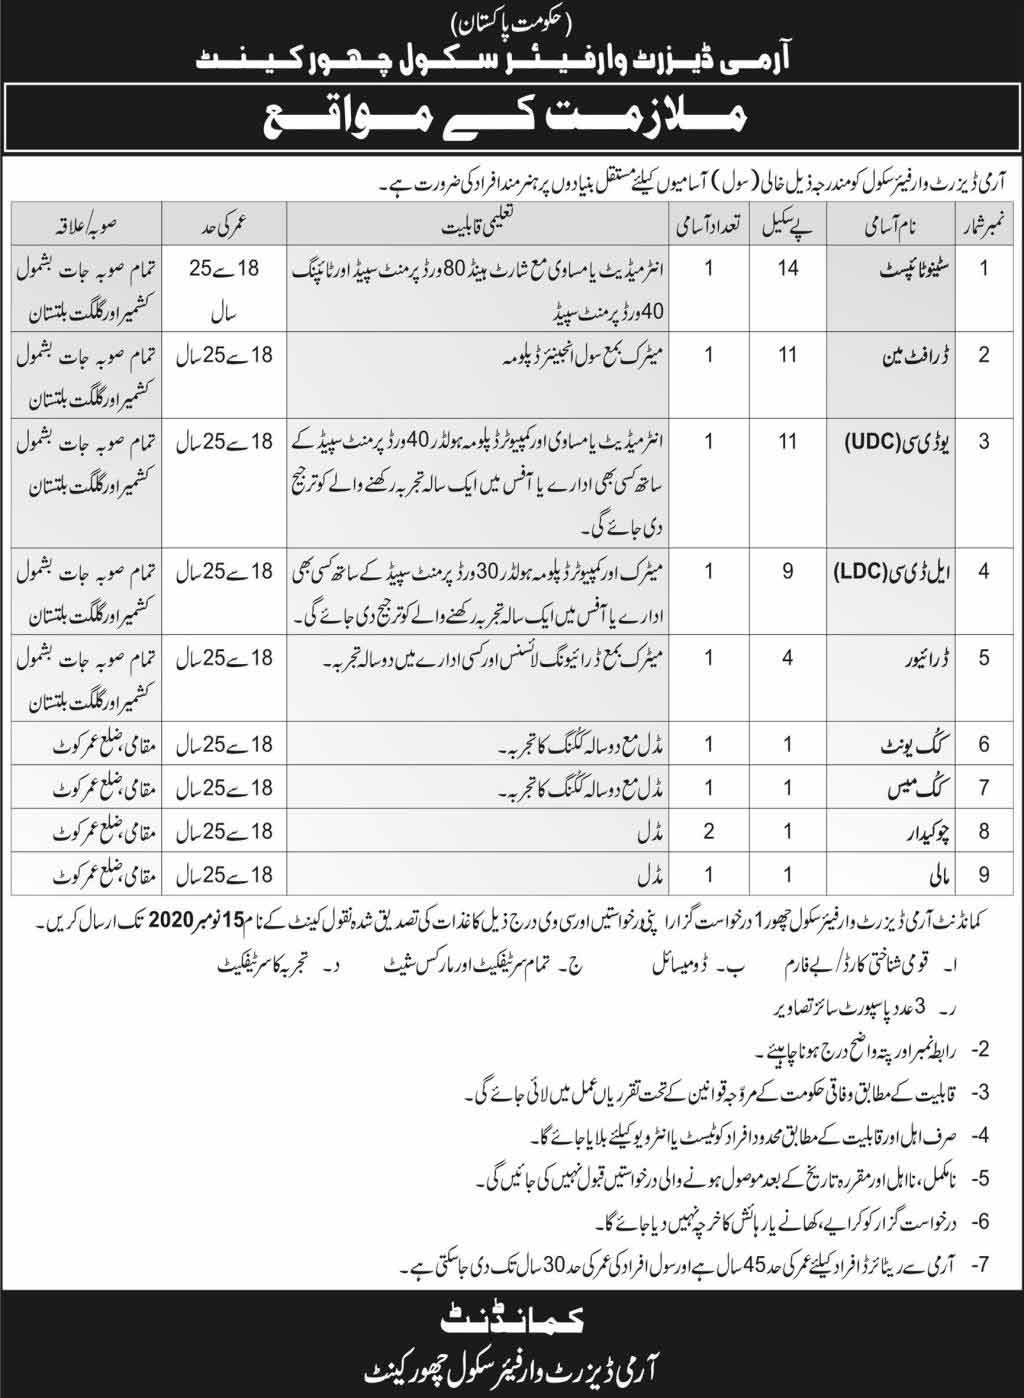 Pakistan Army Desert Warfare School Jobs 2020